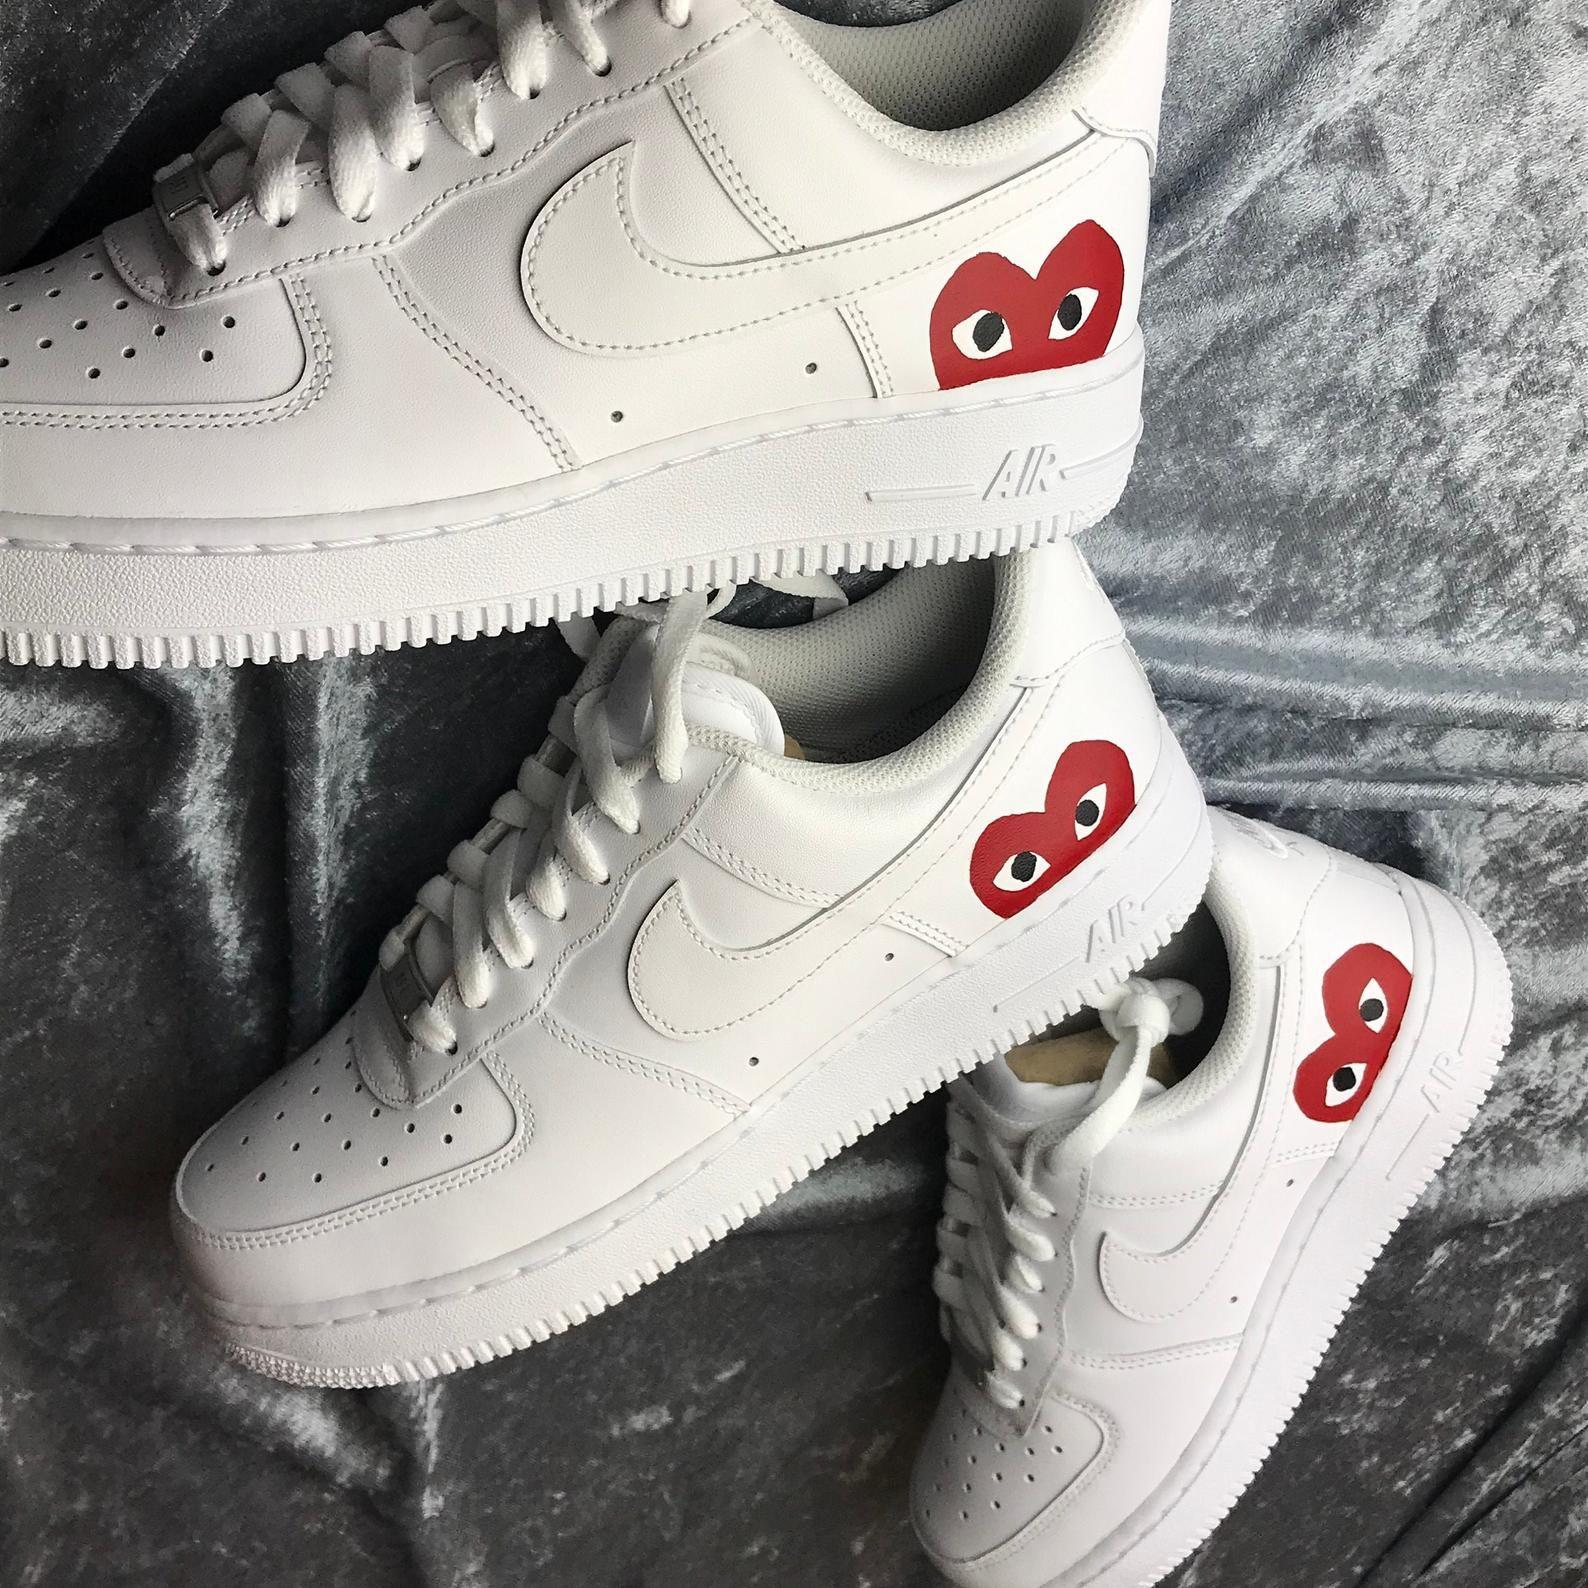 Nike Air Force 1 Custom, Customs Sneakers, Custom Nike Shoes